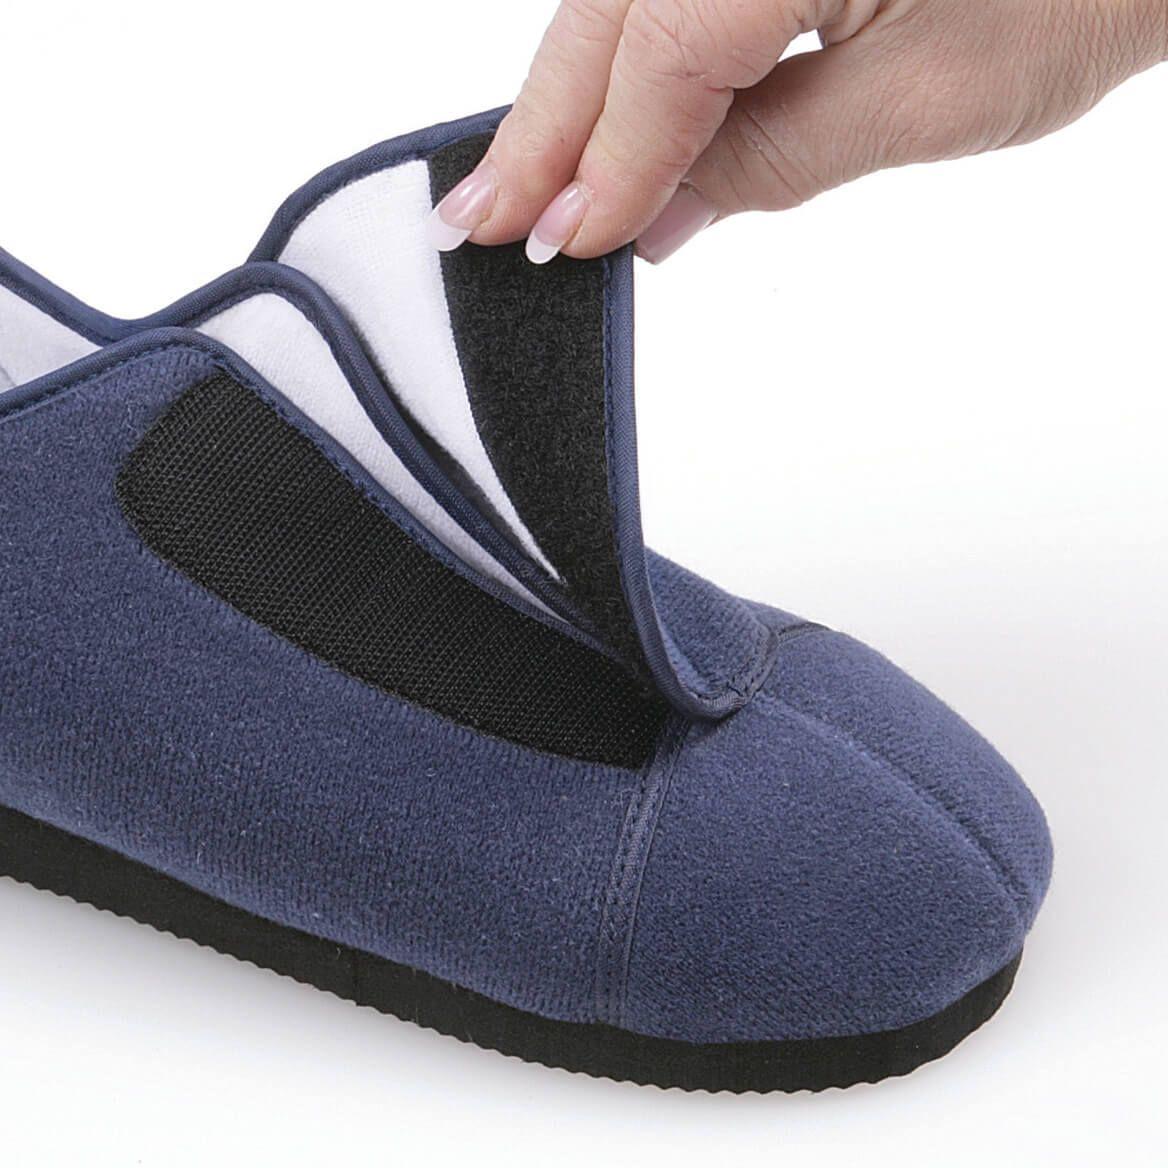 Adjustable Health Slippers Mens-369895